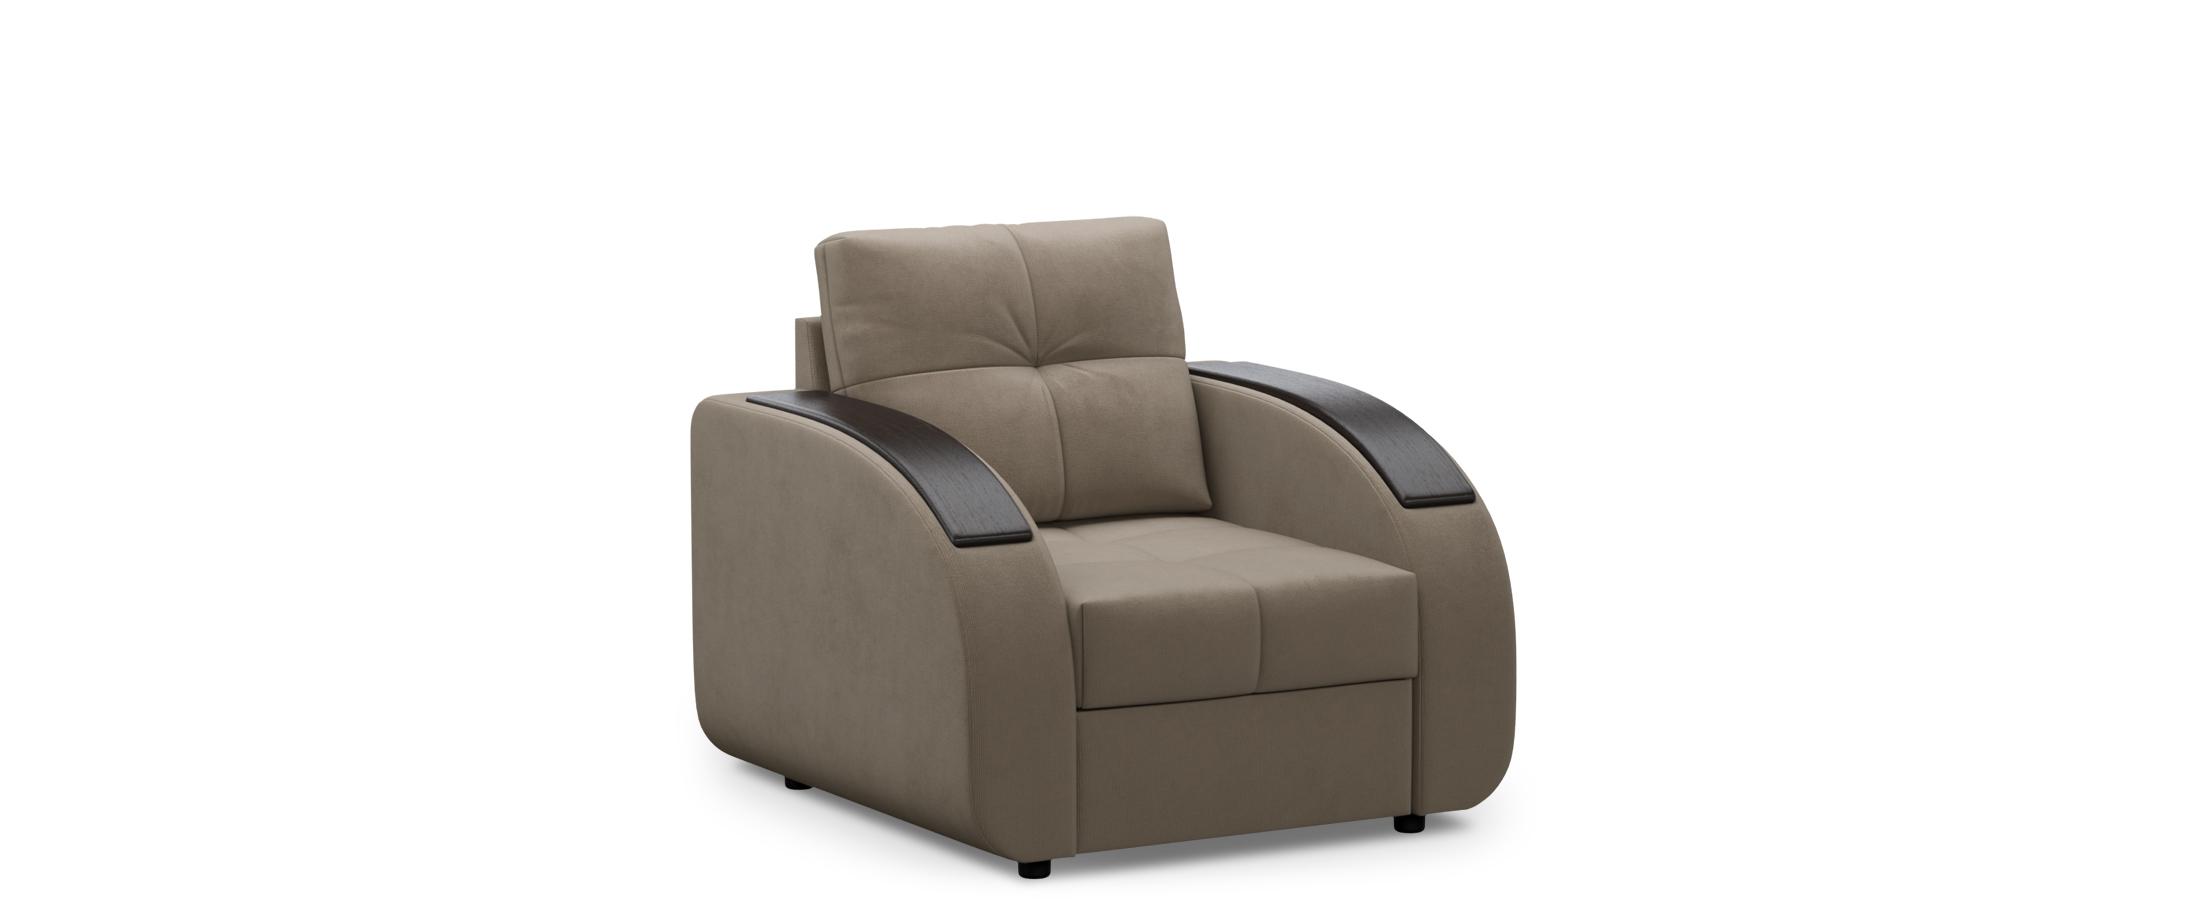 Кресло тканевое Рио 109 фото